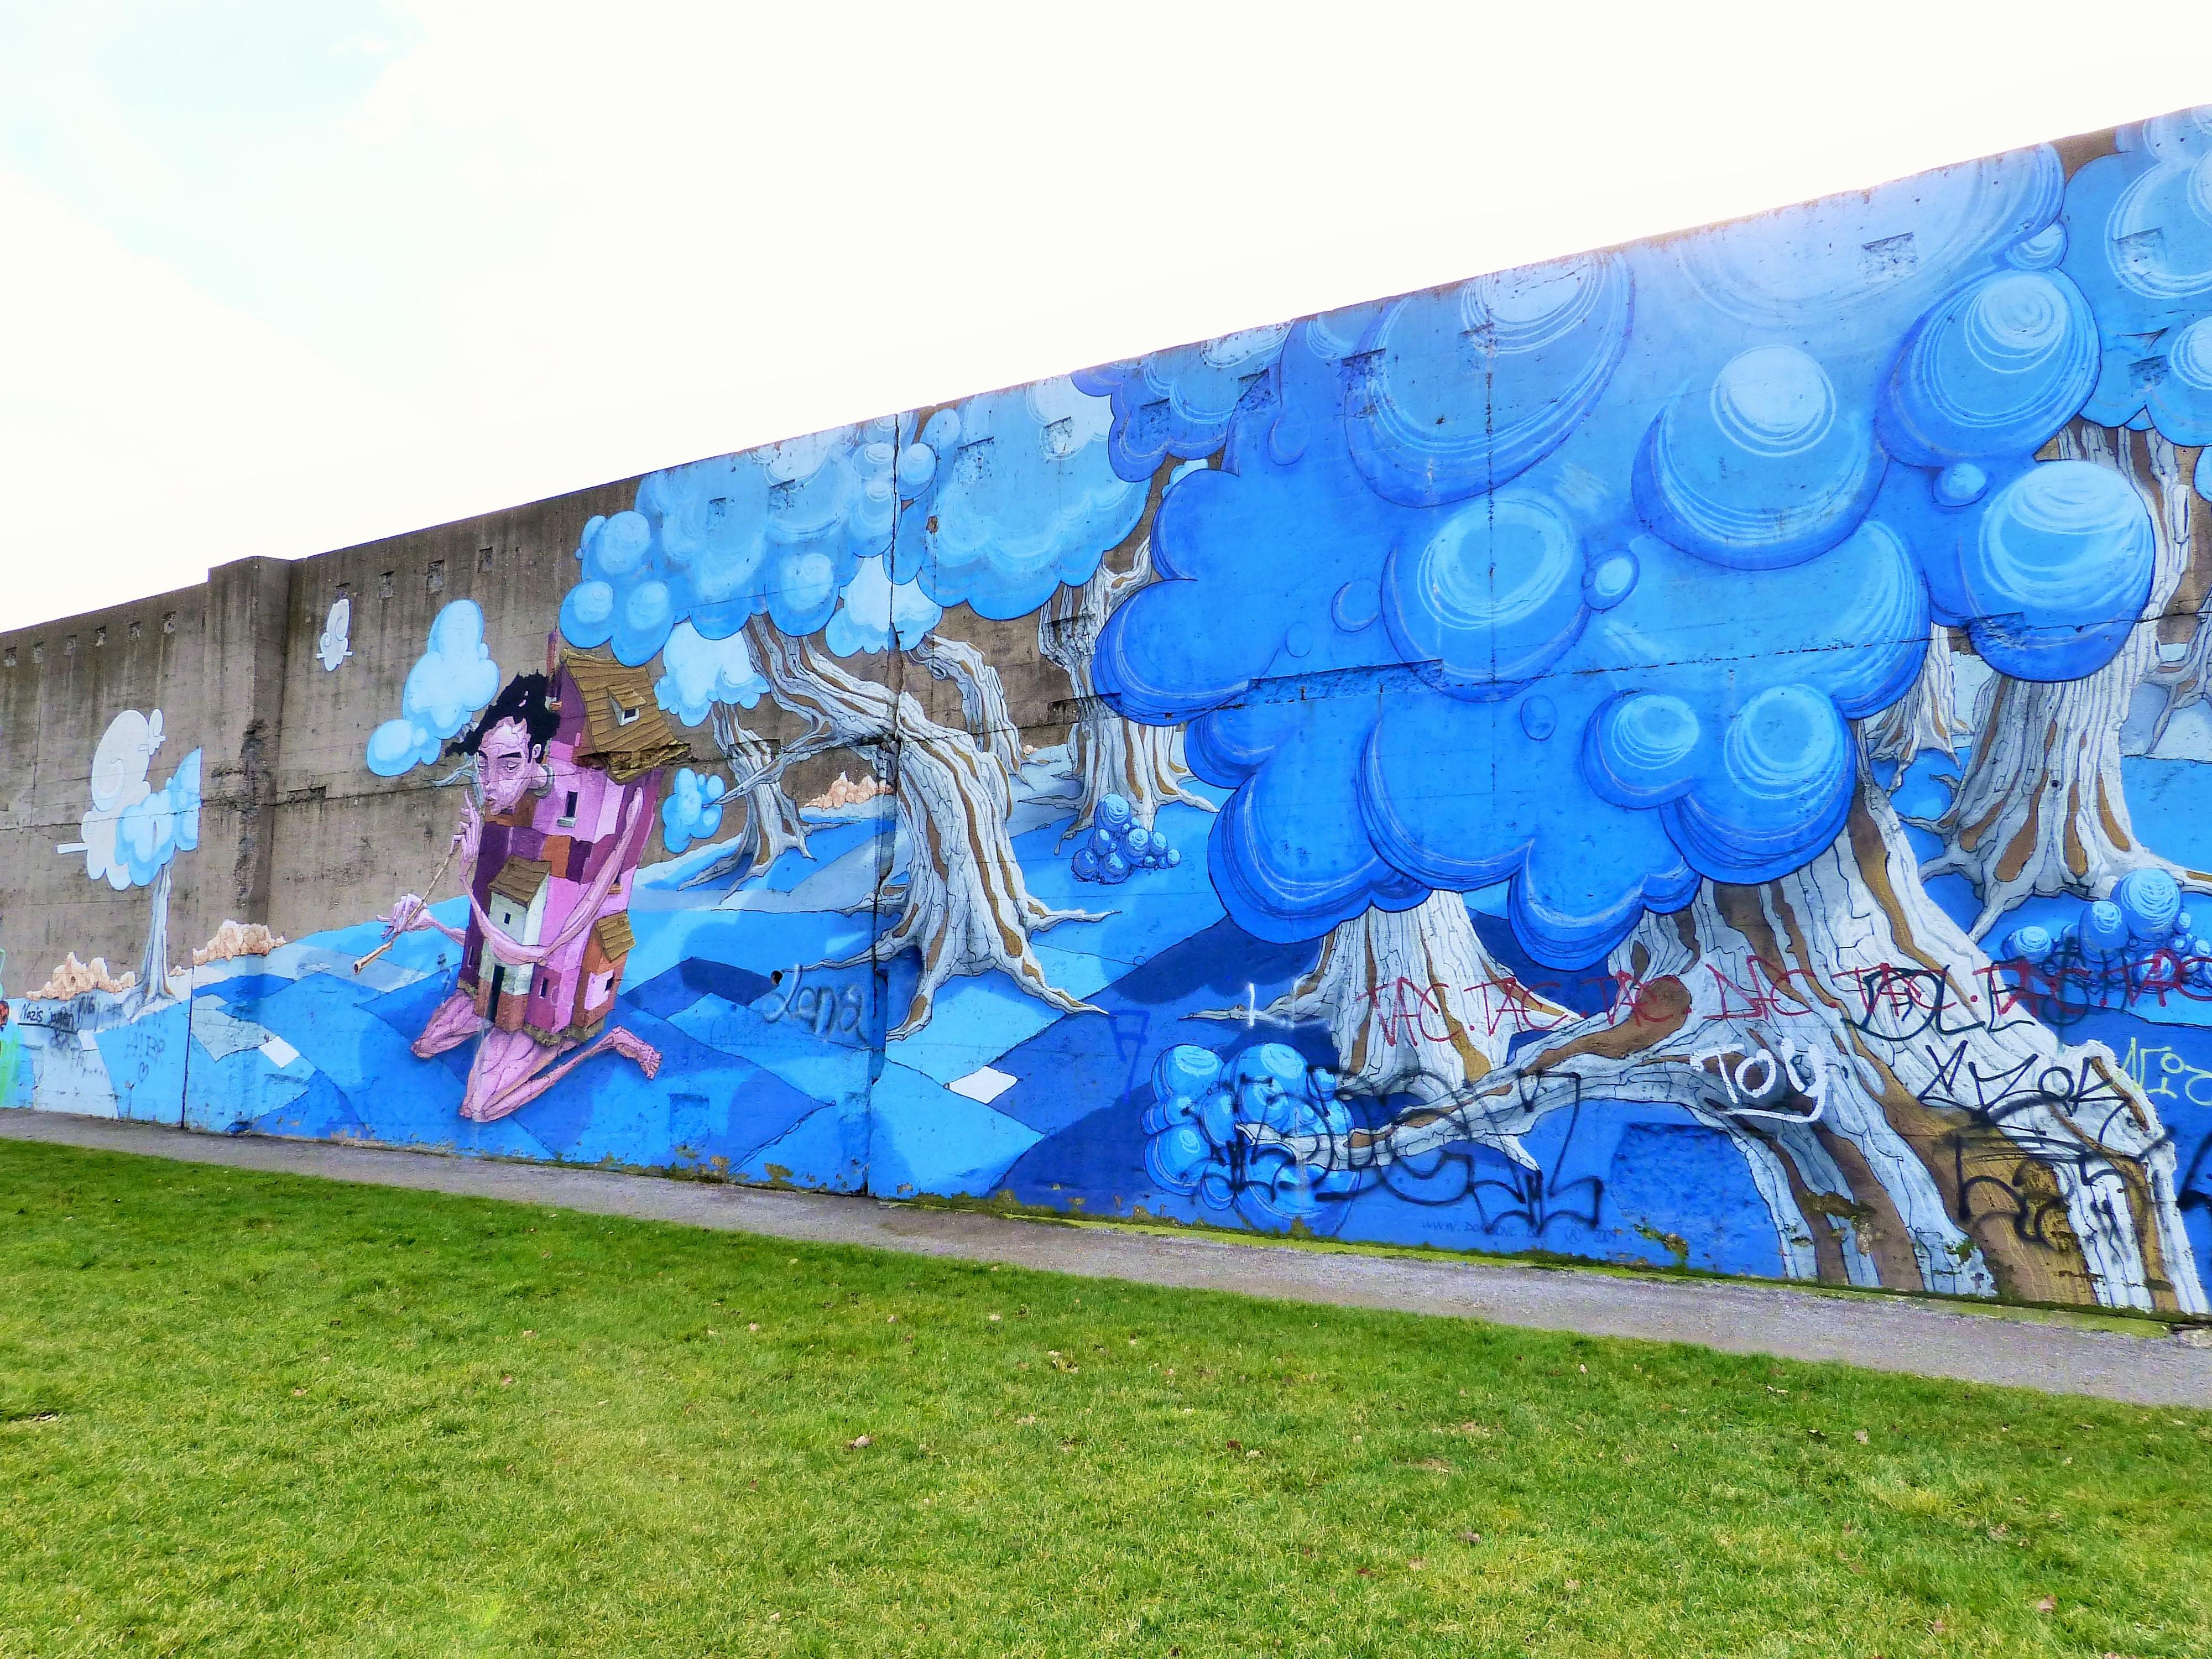 Graffiti Duisburg rheinpark graffiti duisburg 8 continental breakfast travel